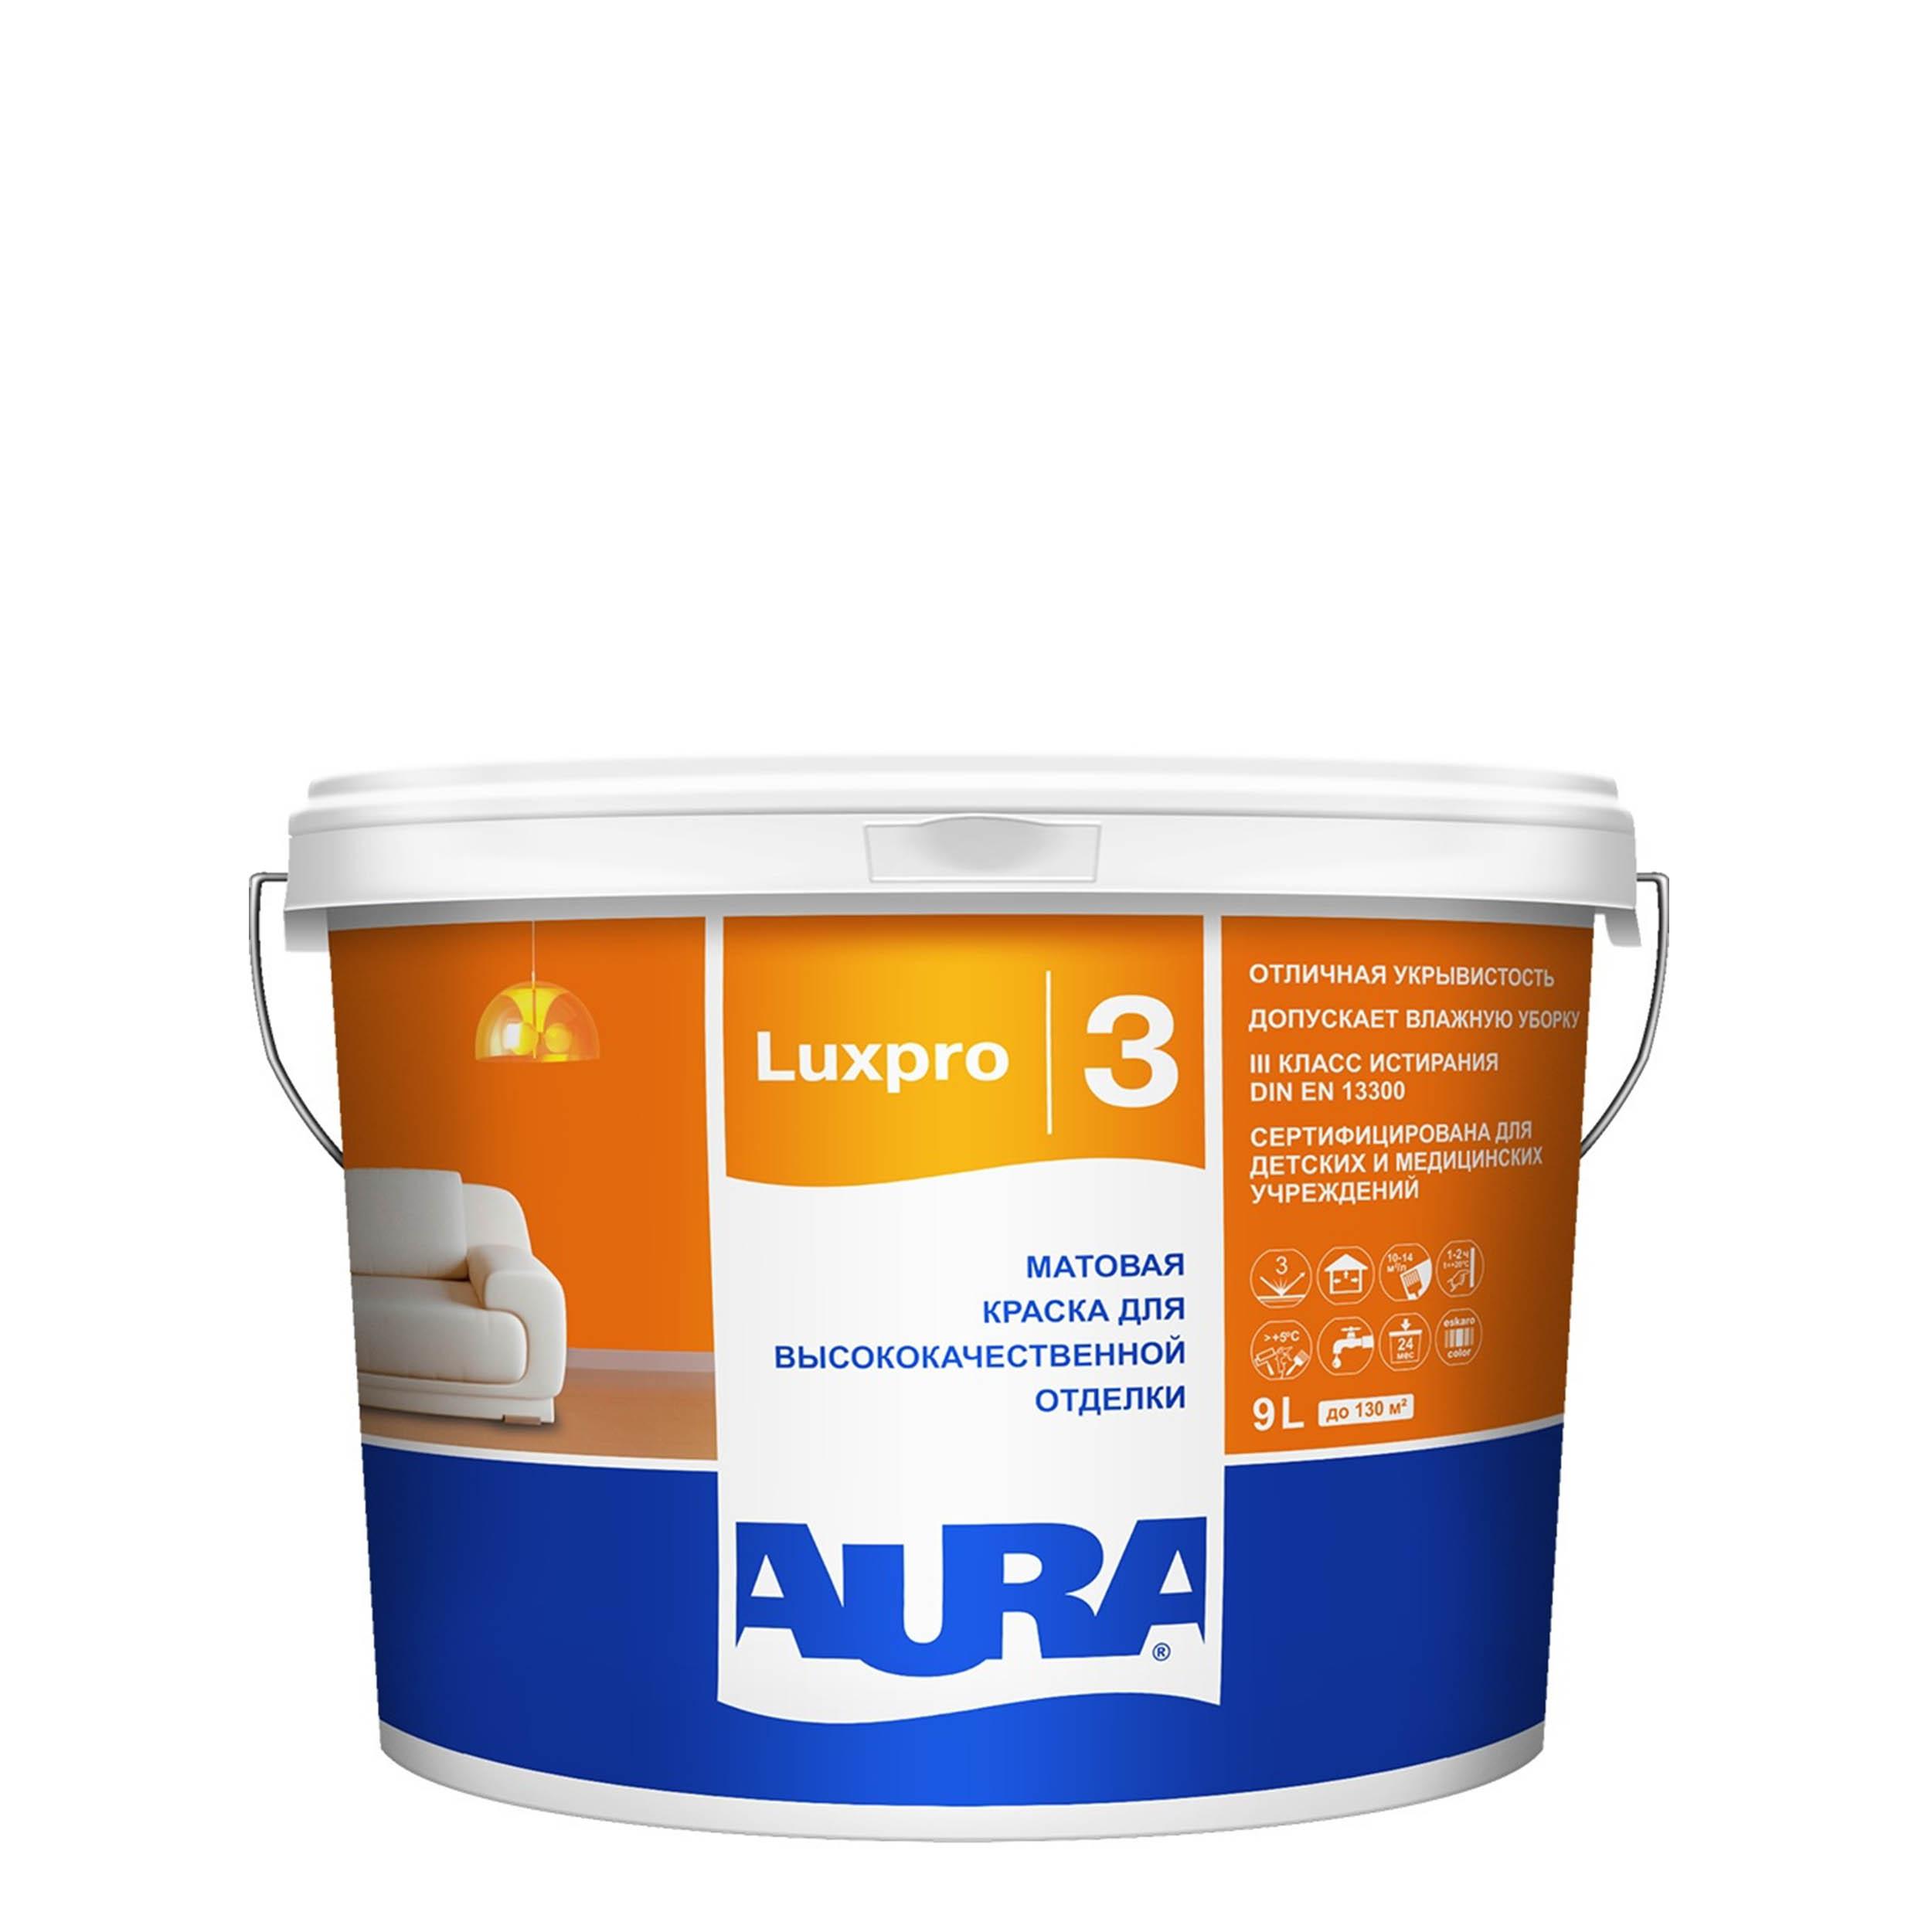 Фото 4 - Краска интерьерная, Aura LuxPRO 3, RAL 8017, 11 кг.